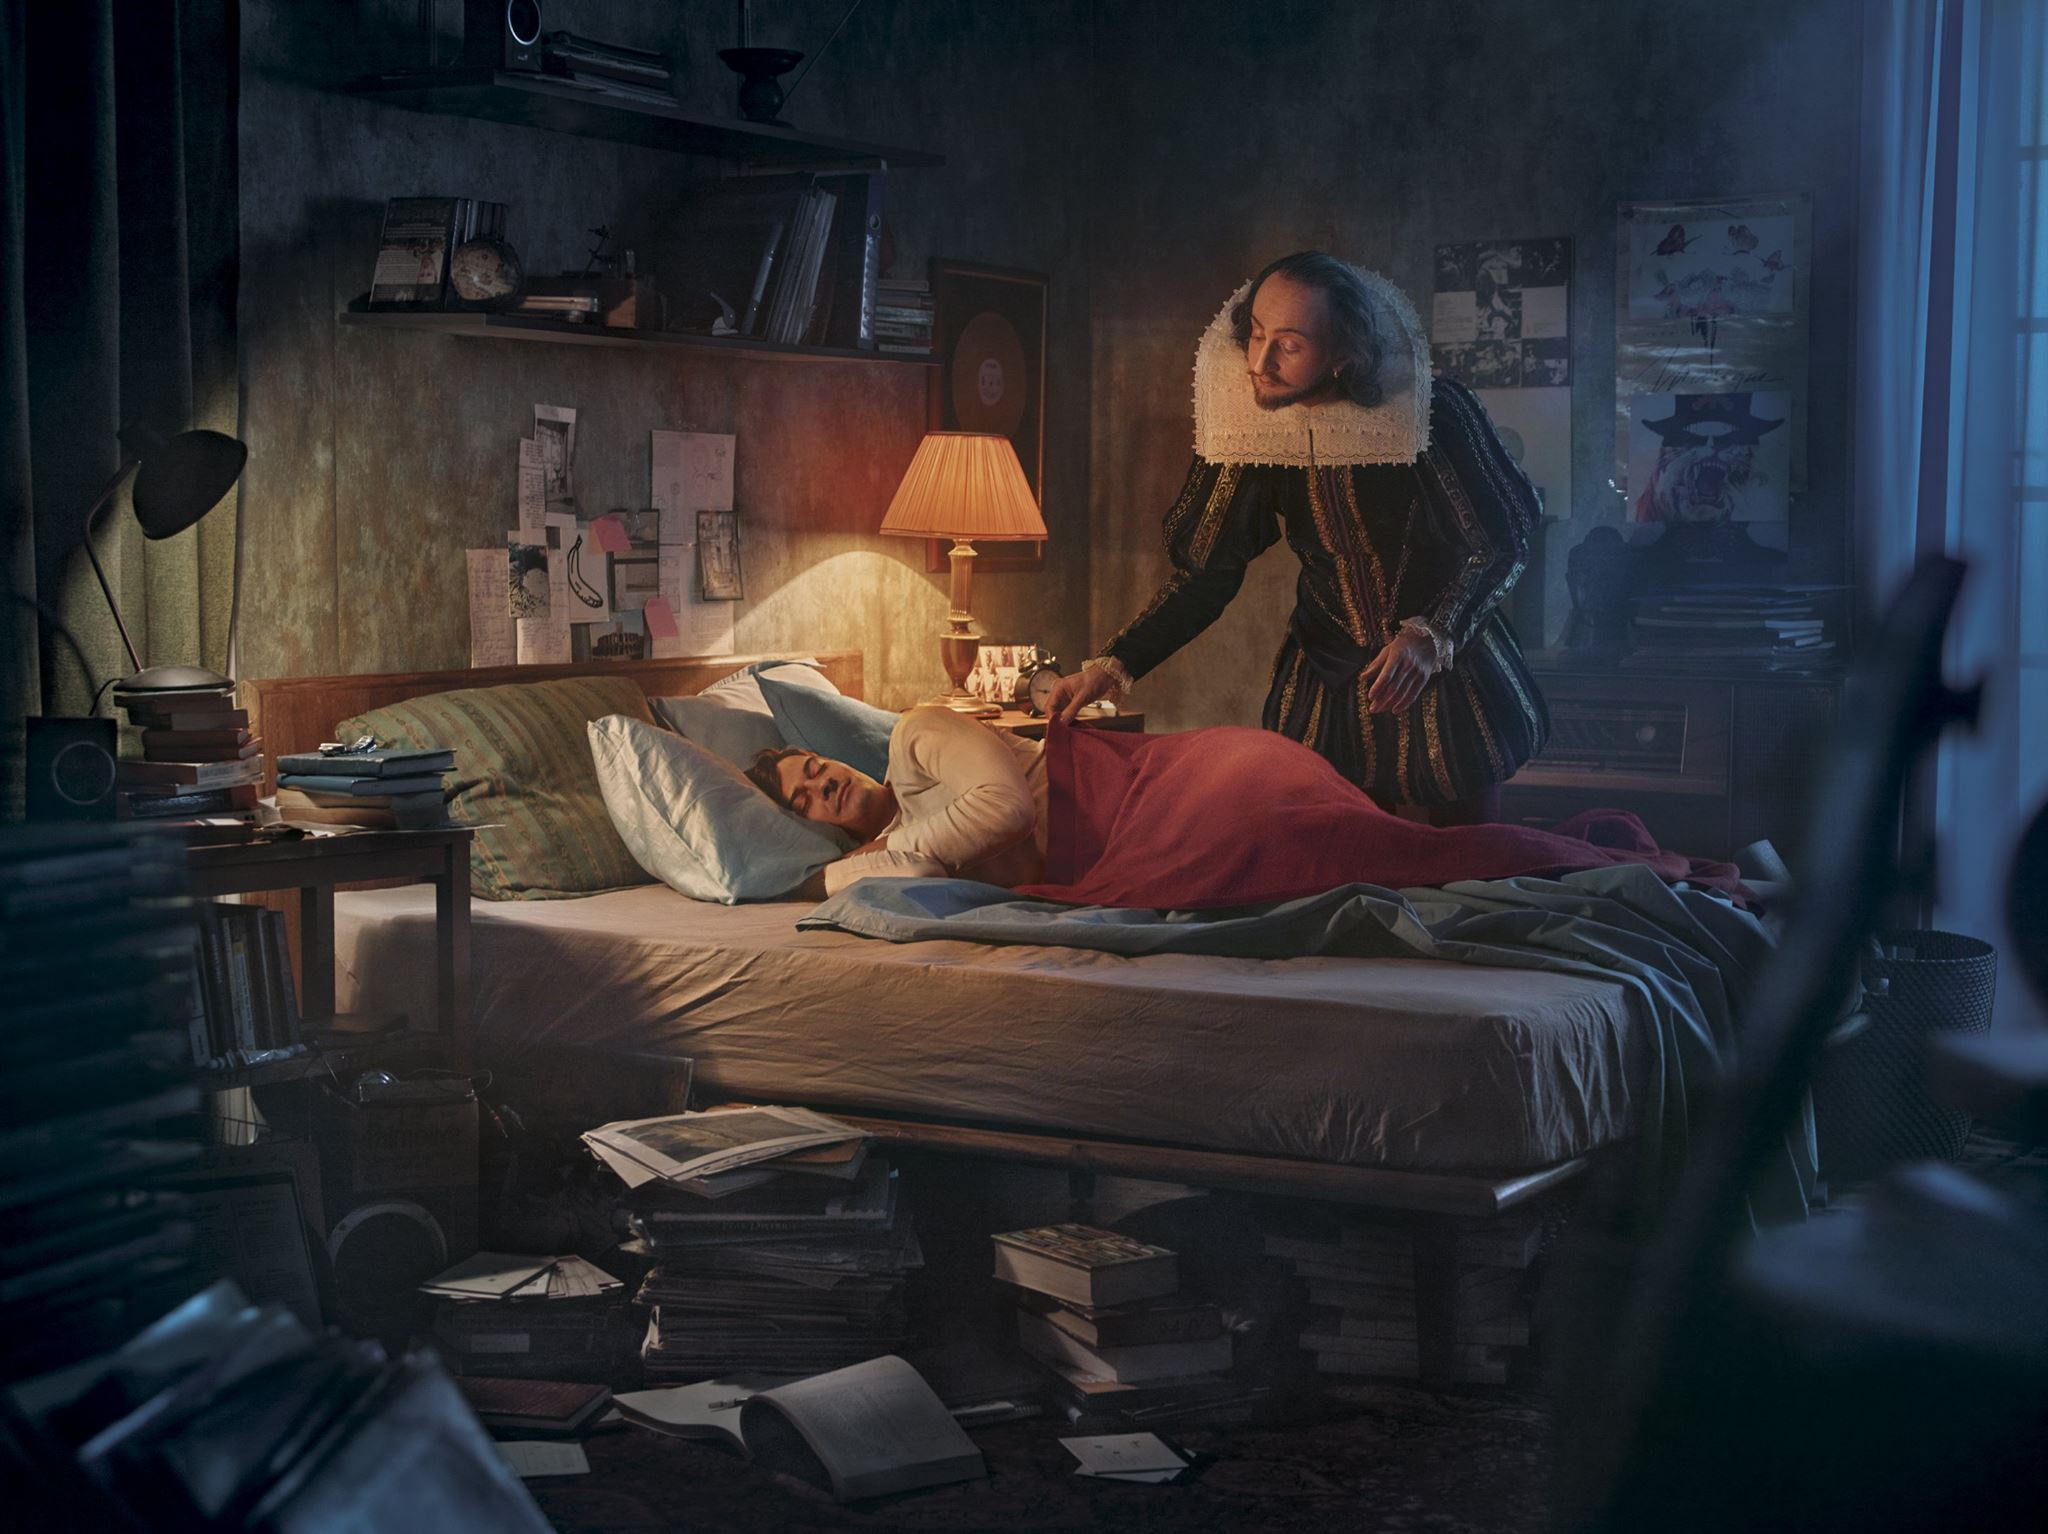 novels help sleep you better campaign – Dubai _3